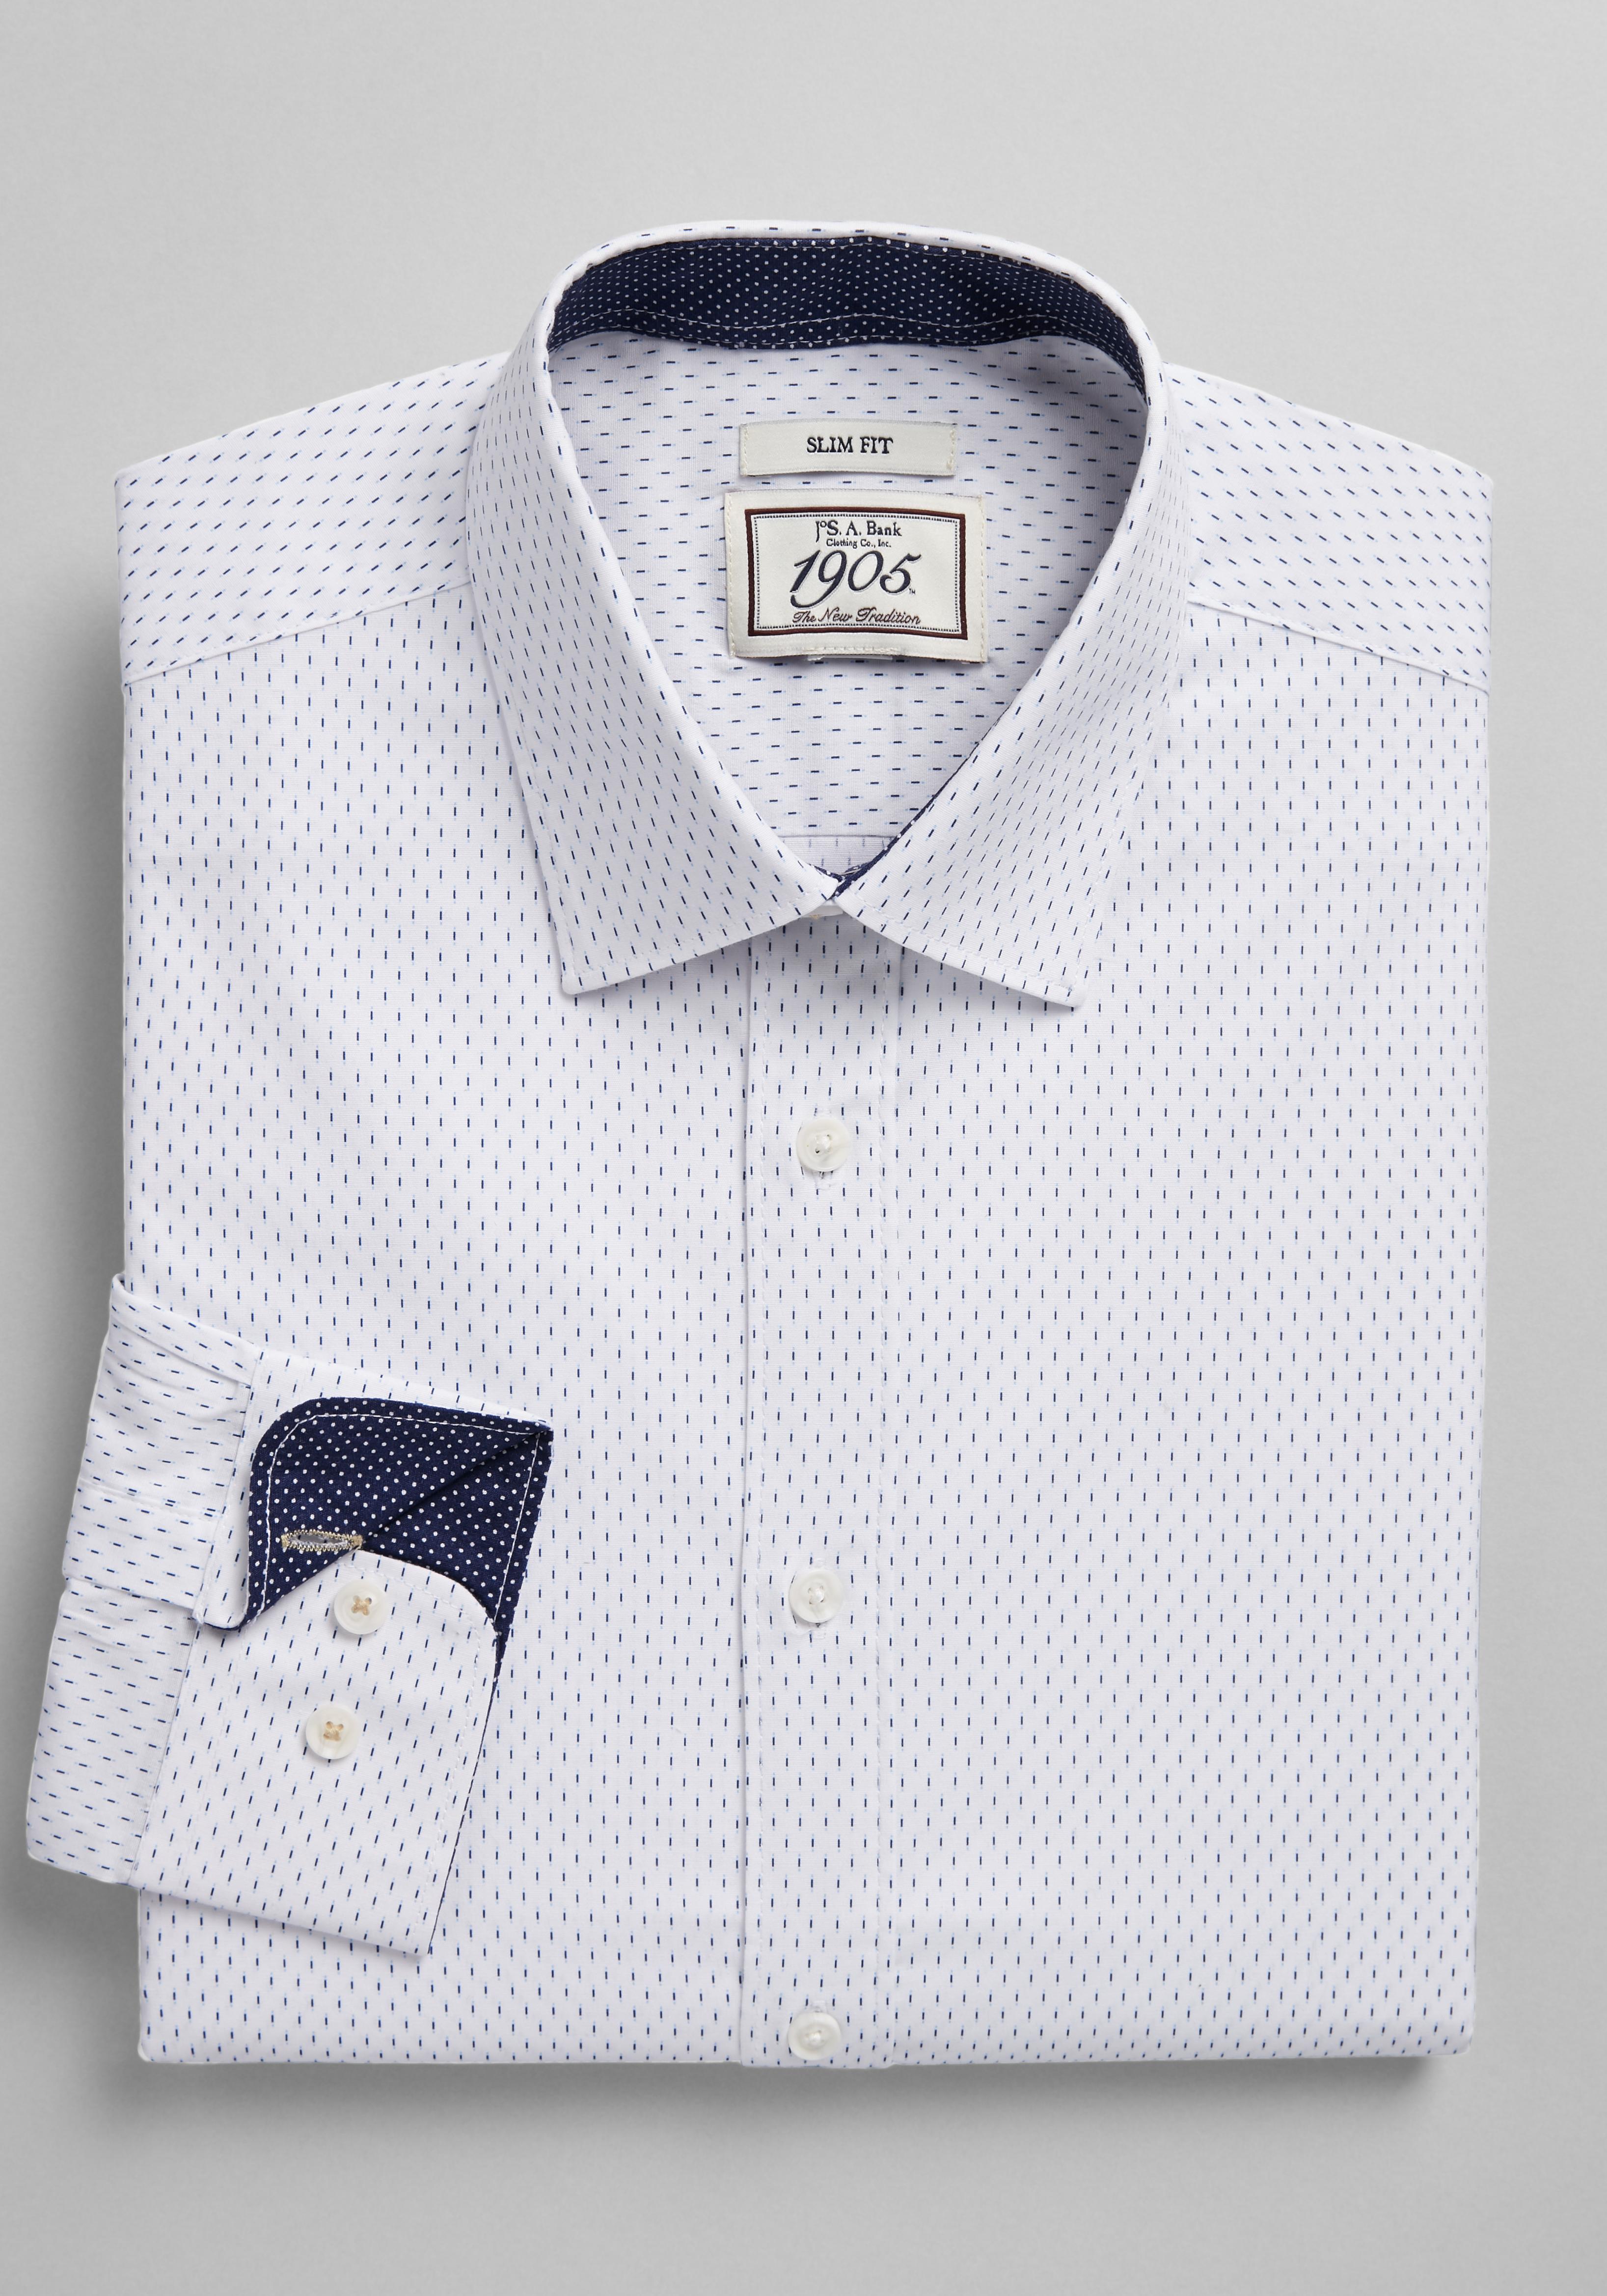 Design Bank Twist.1905 Collection Slim Fit Spread Collar Dash Print Dress Shirt